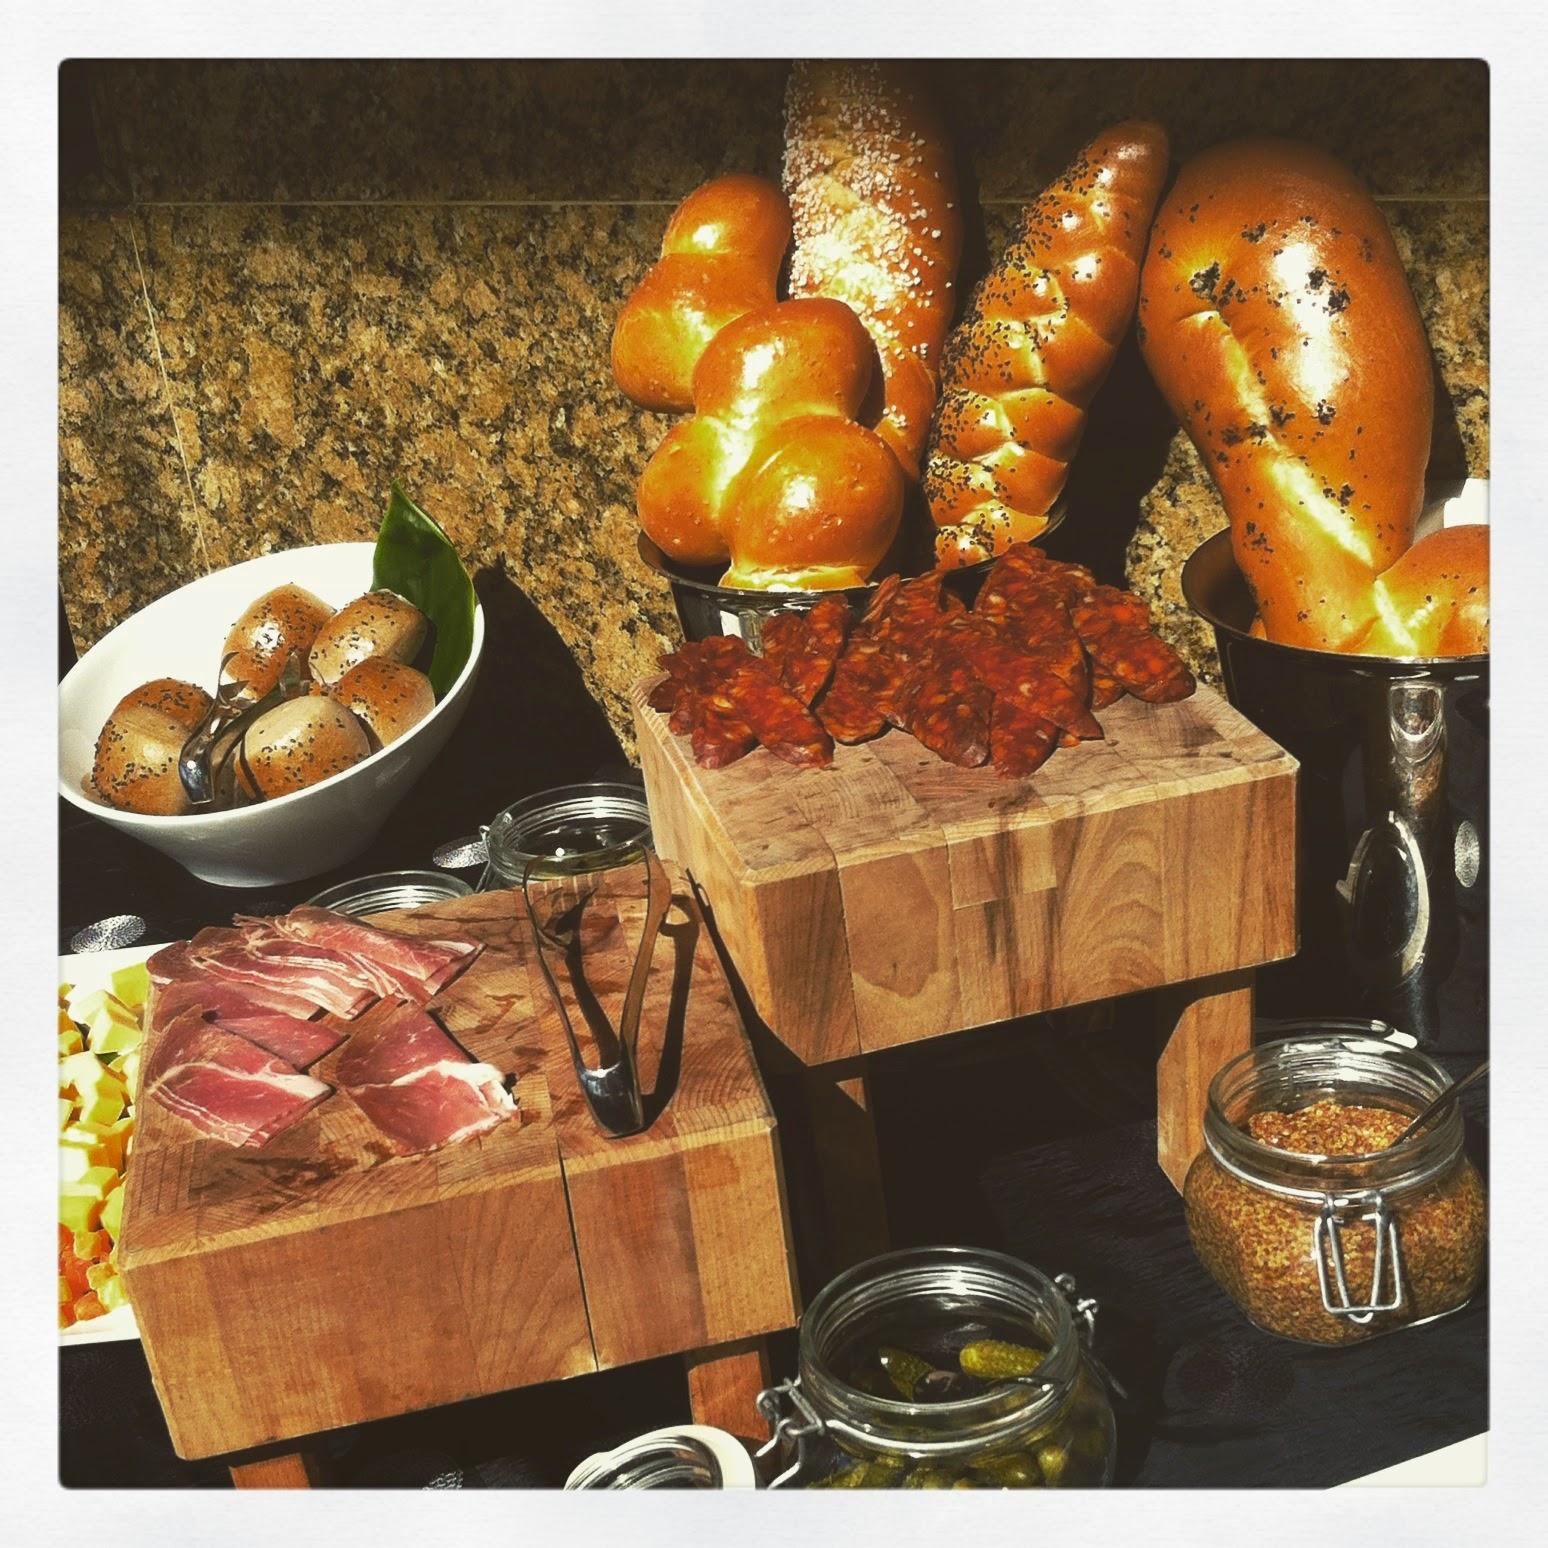 Using butcher block displays to show food